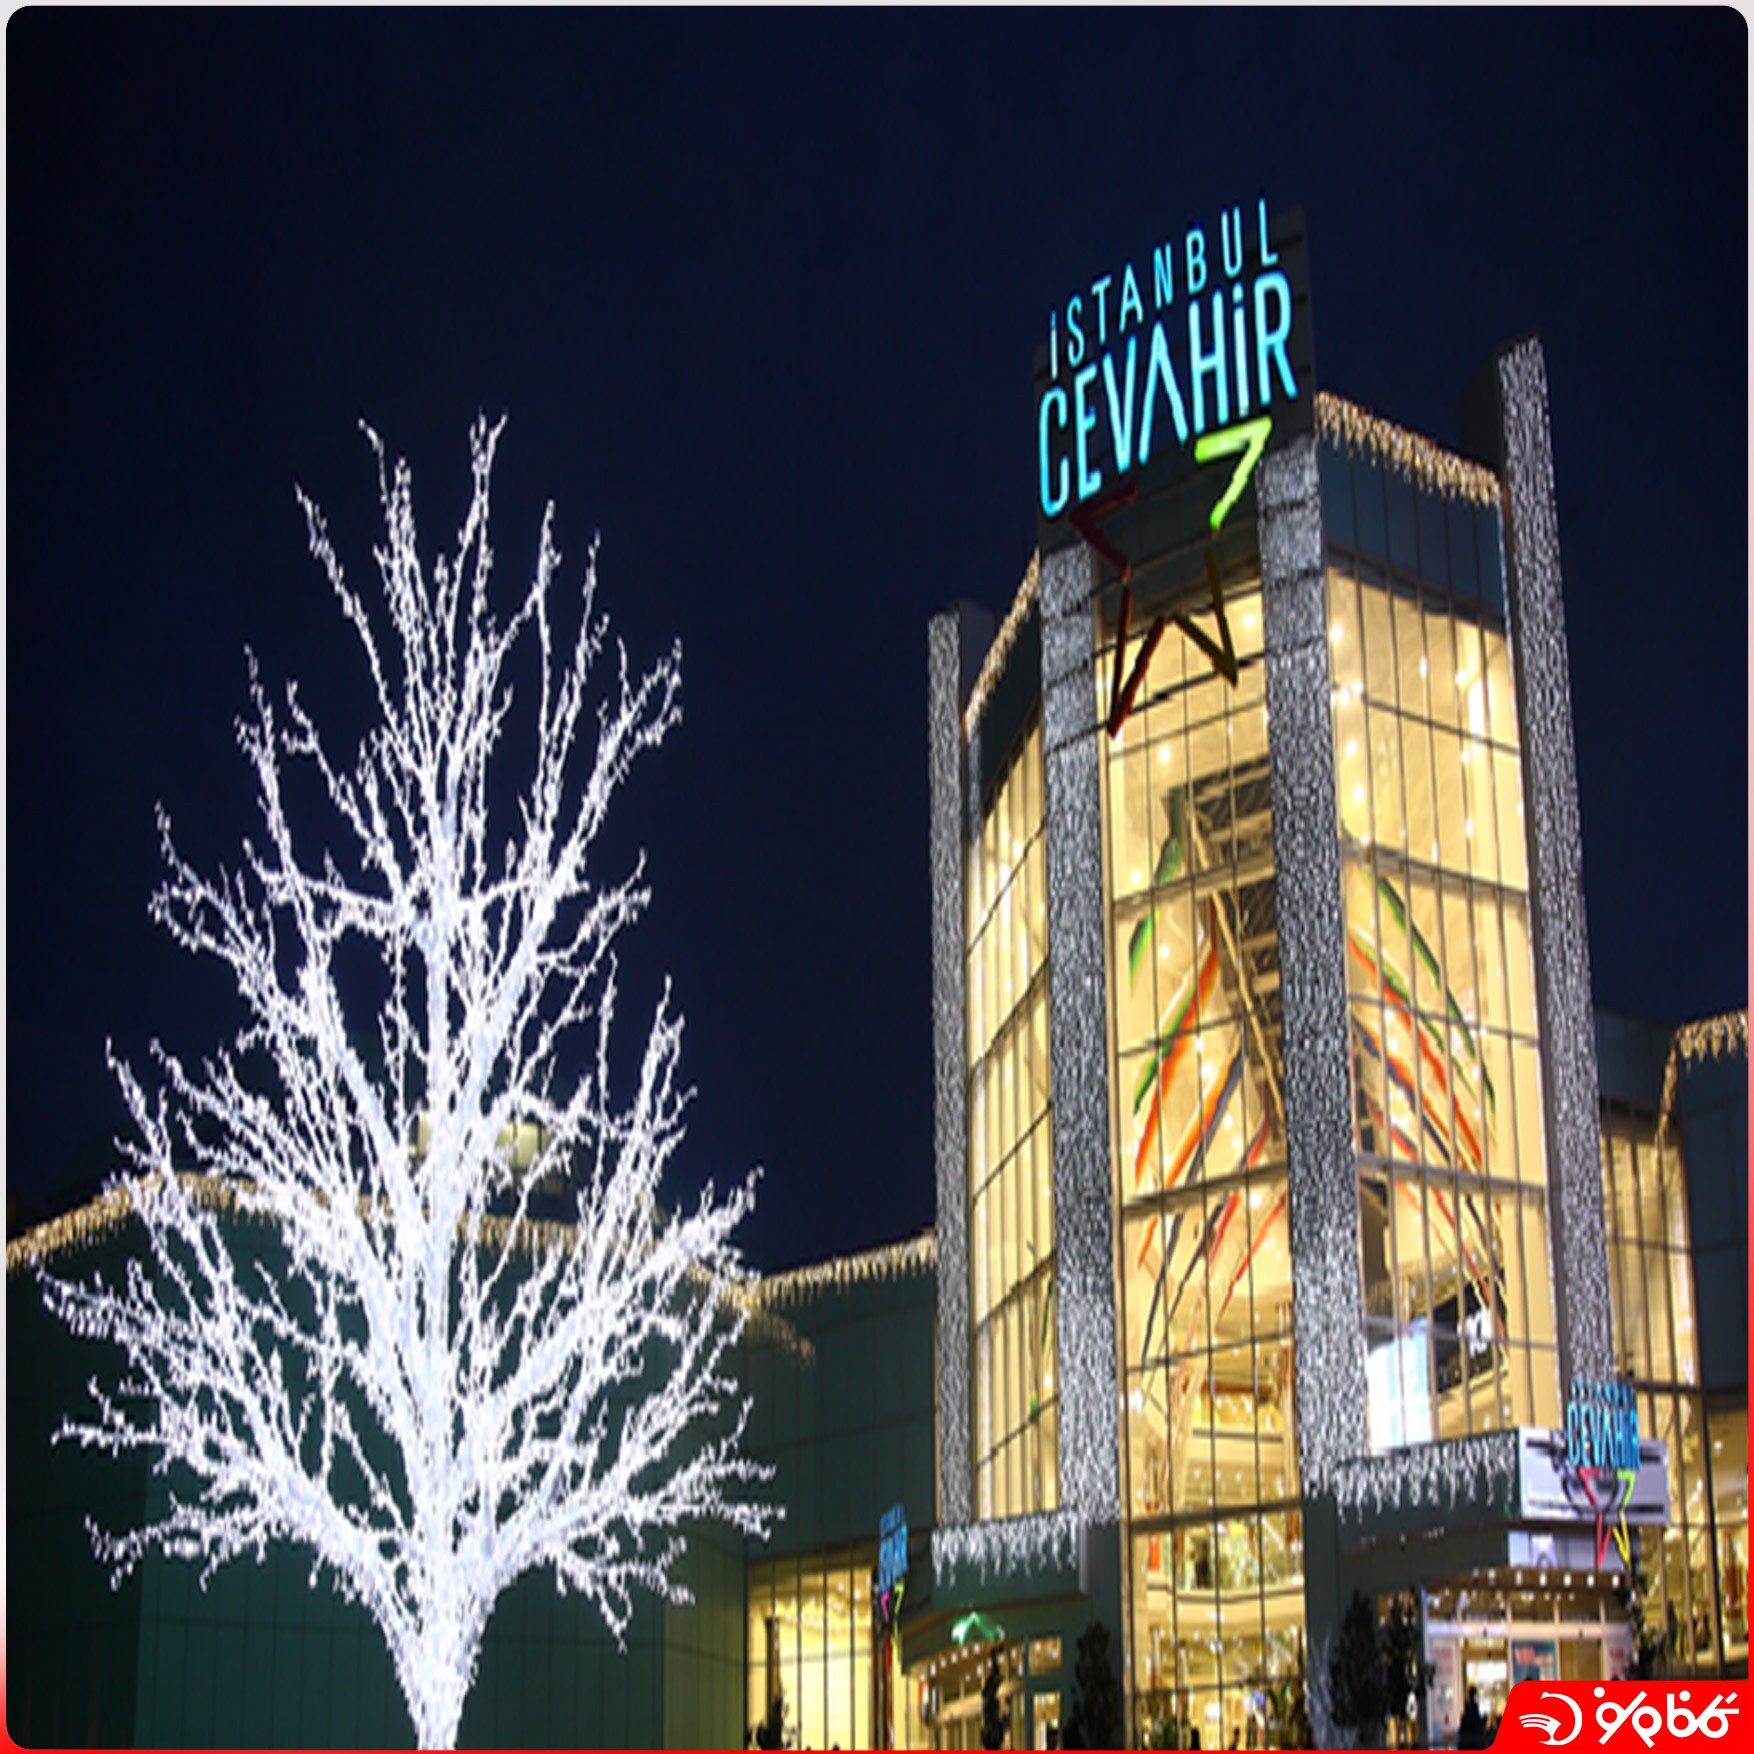 مرکز خرید جواهیر- CEVAHIR MALL